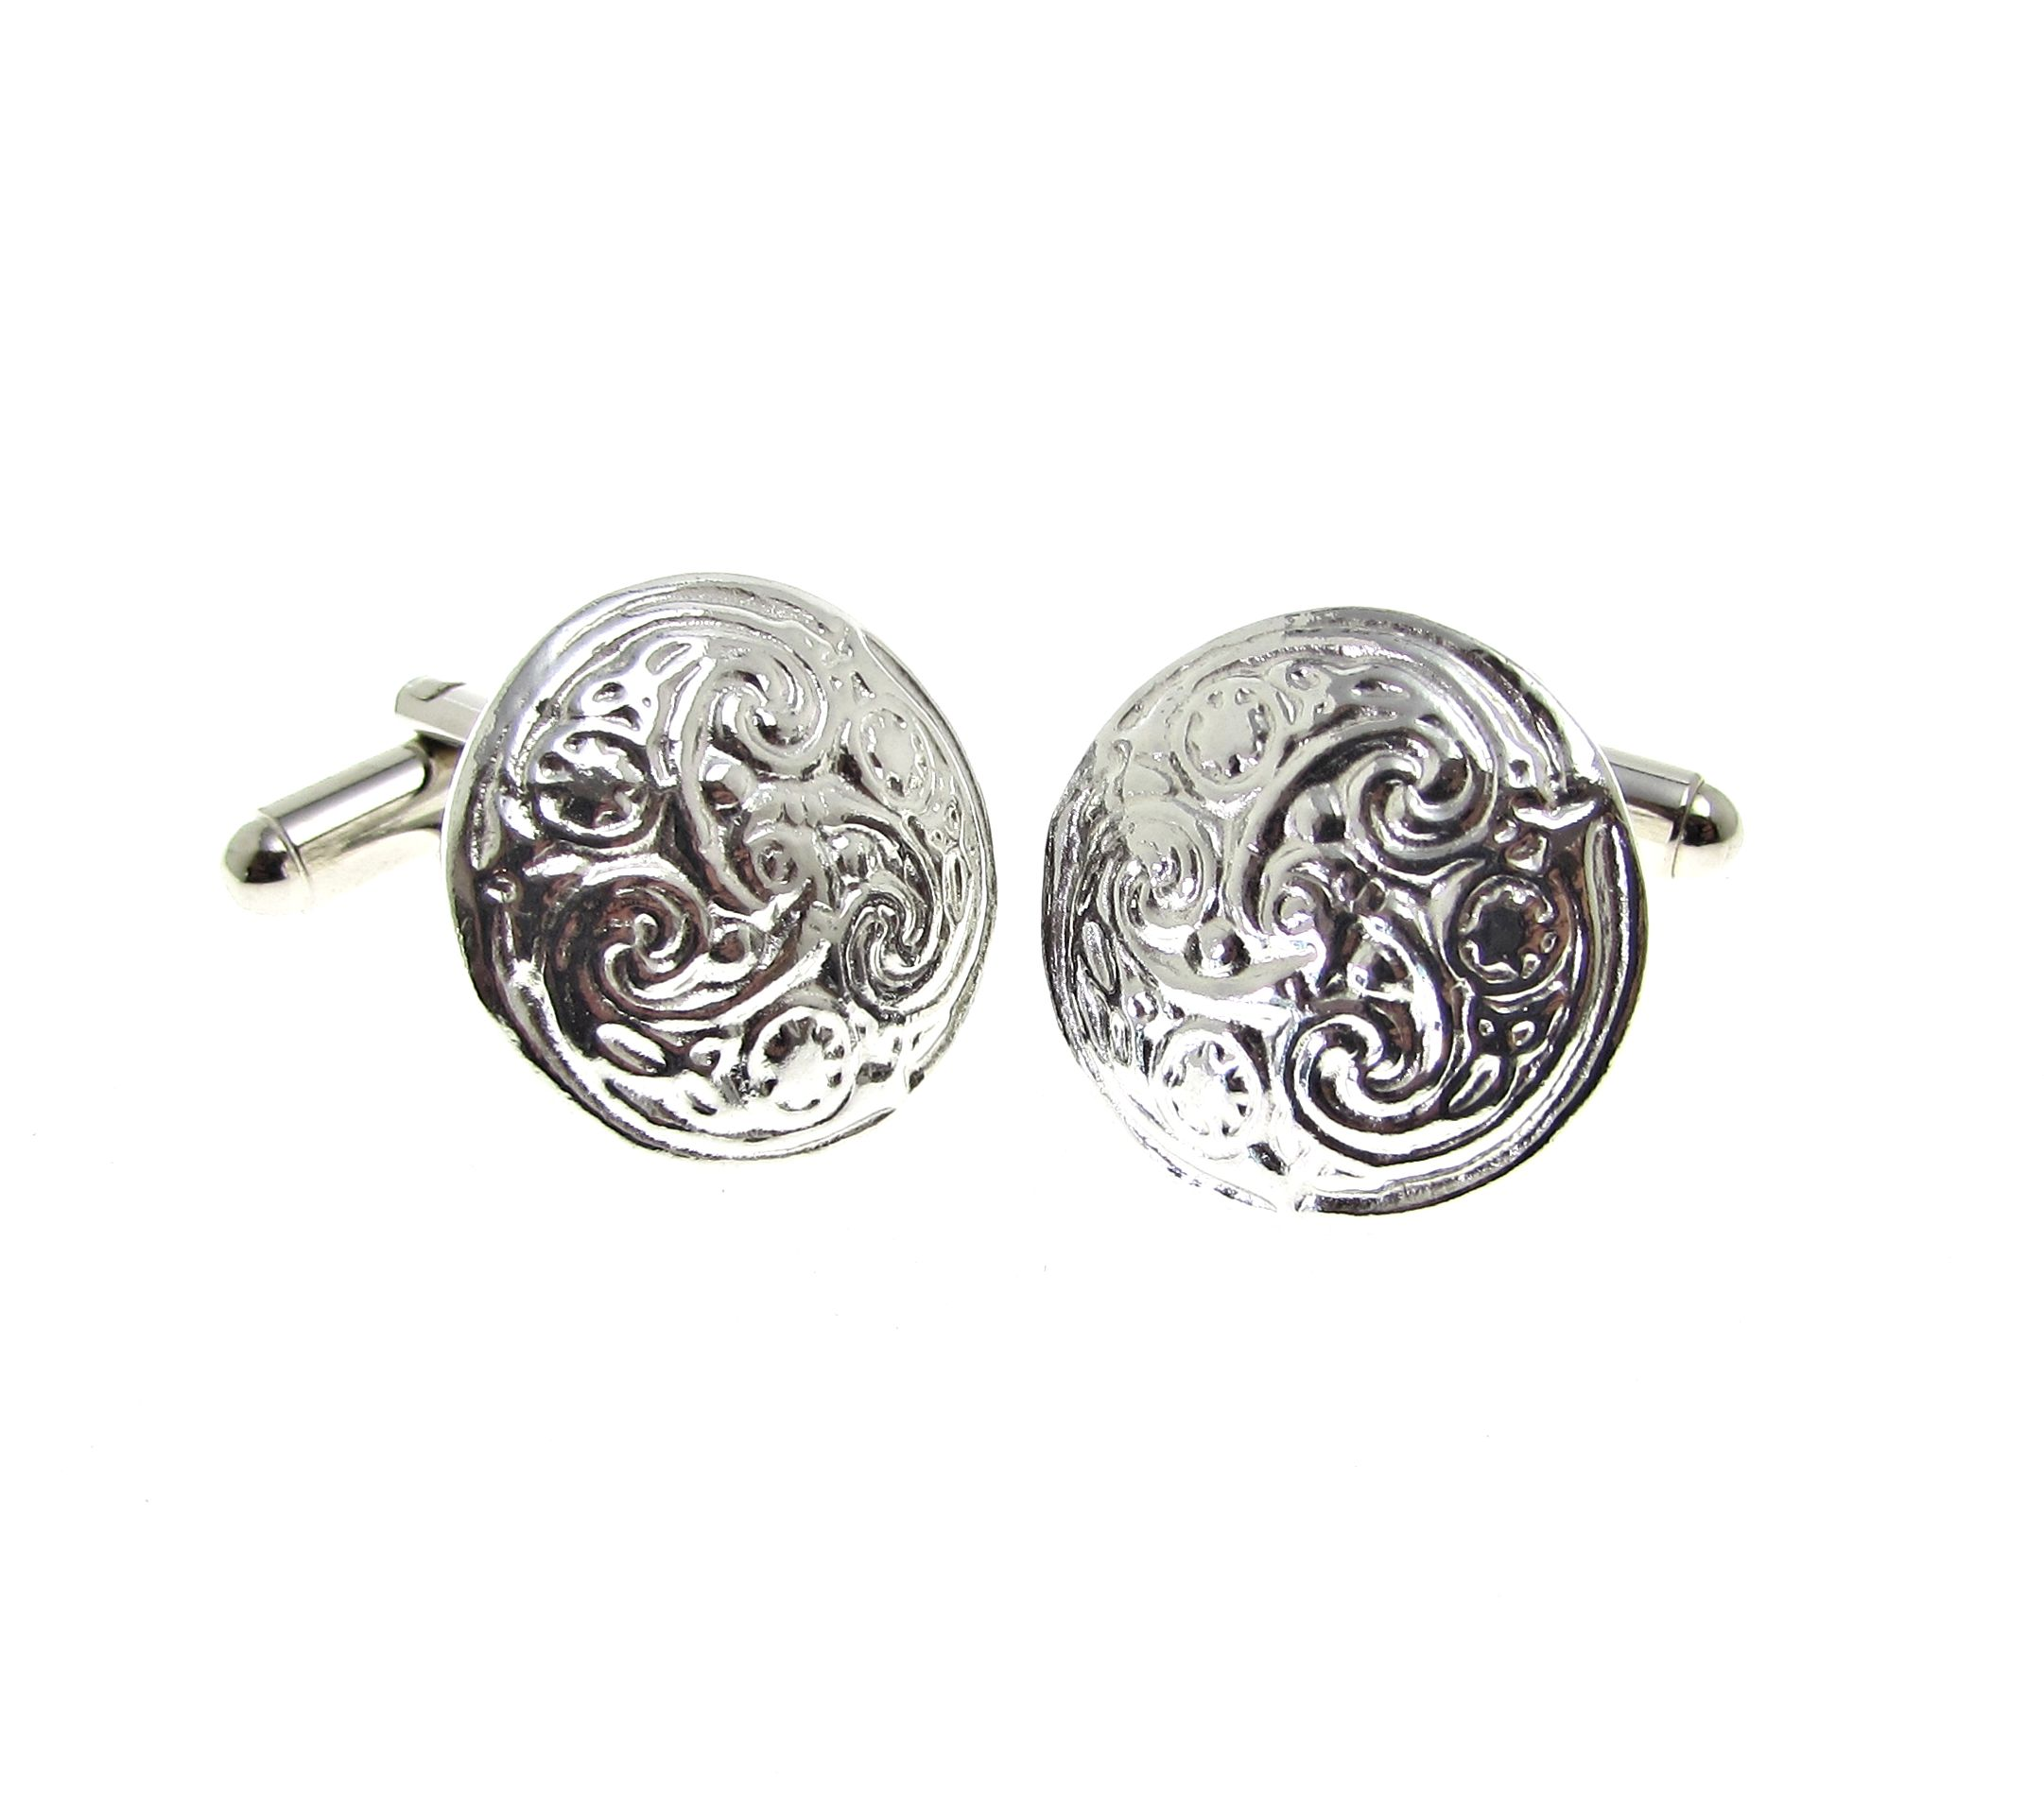 Cornish tin cuff links with swirl pattern